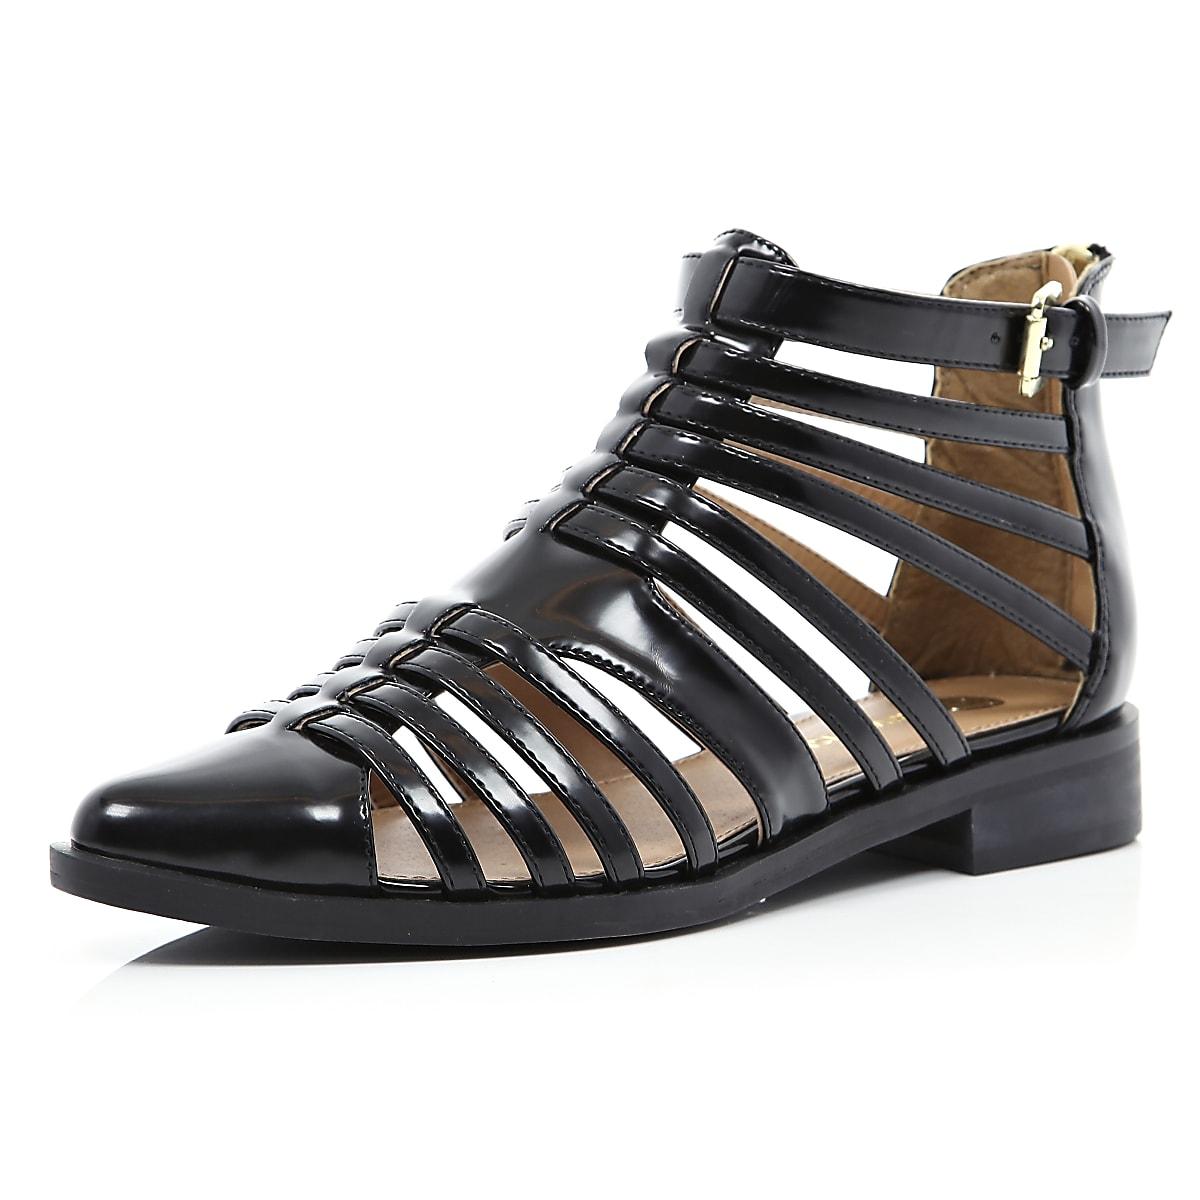 b7198cfae Black patent closed toe gladiator sandals - Sandals - Shoes   Boots - women